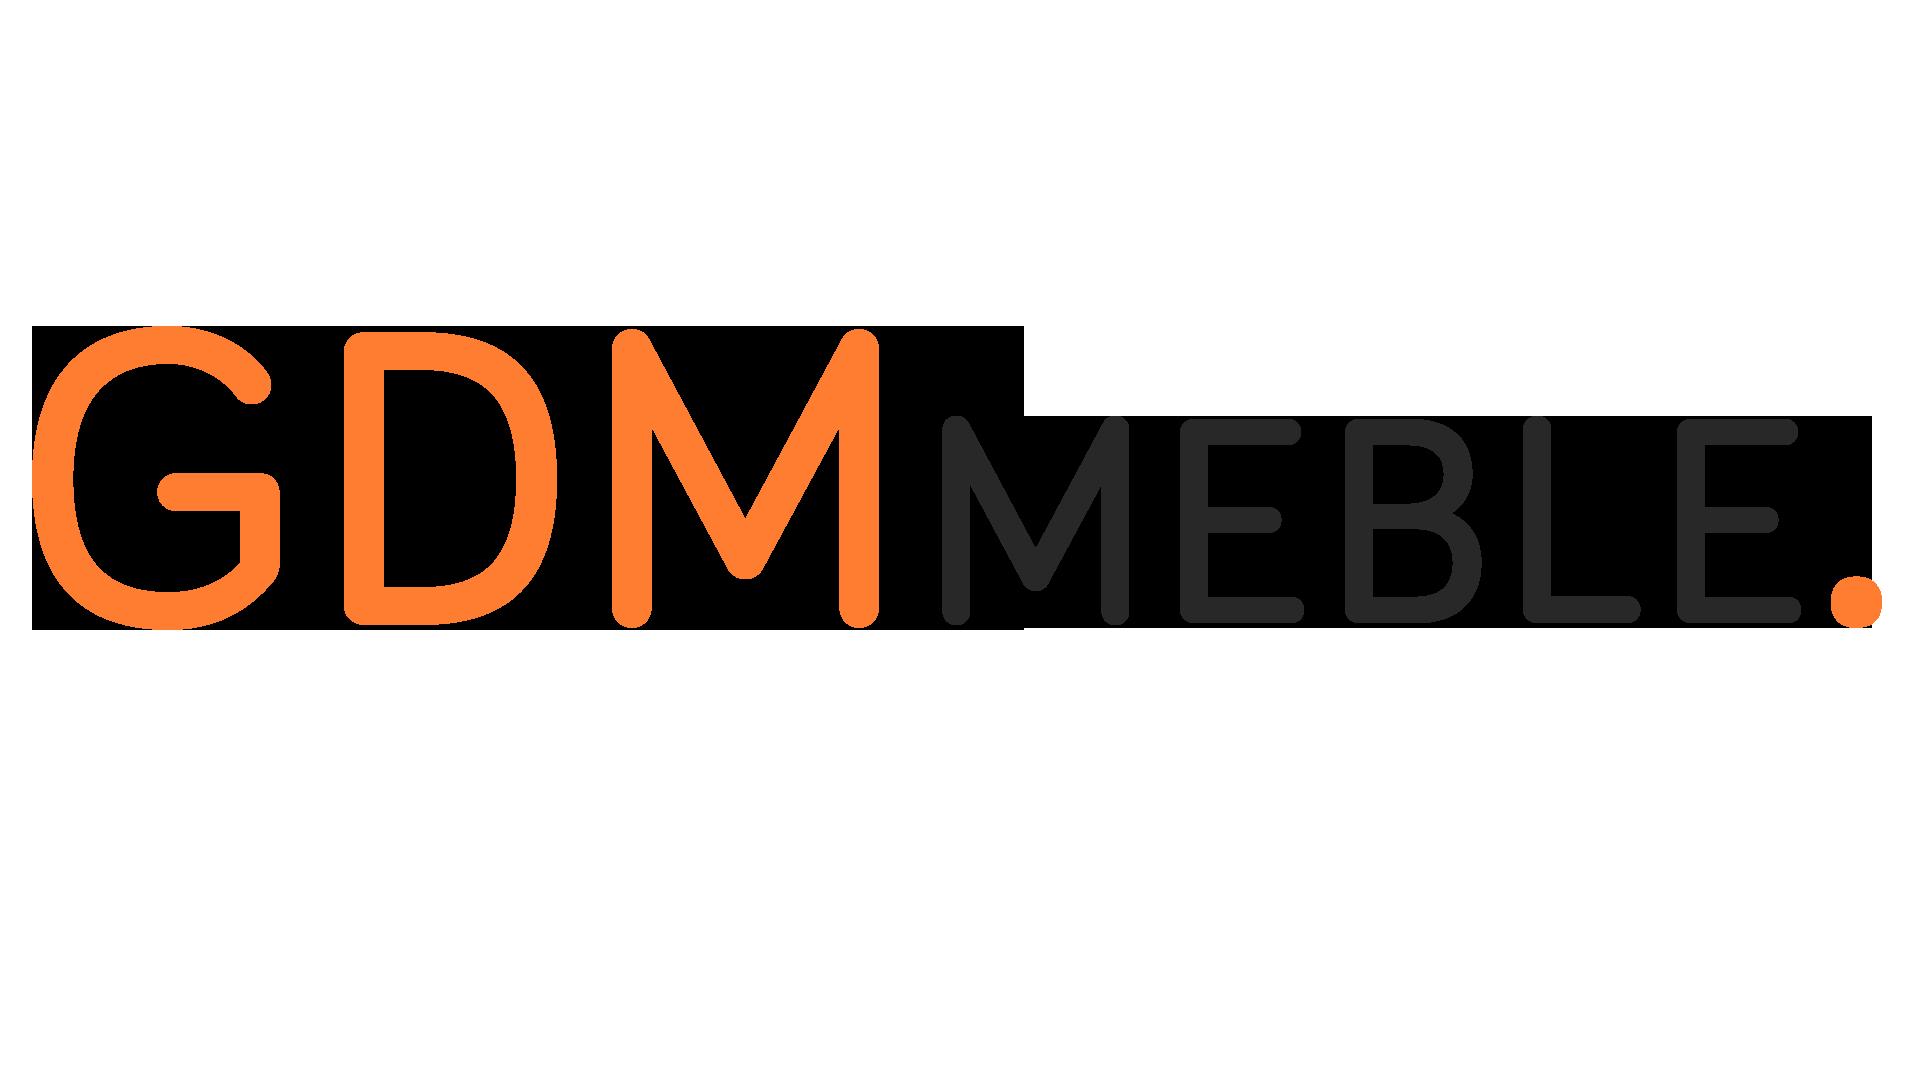 logo gdm meble